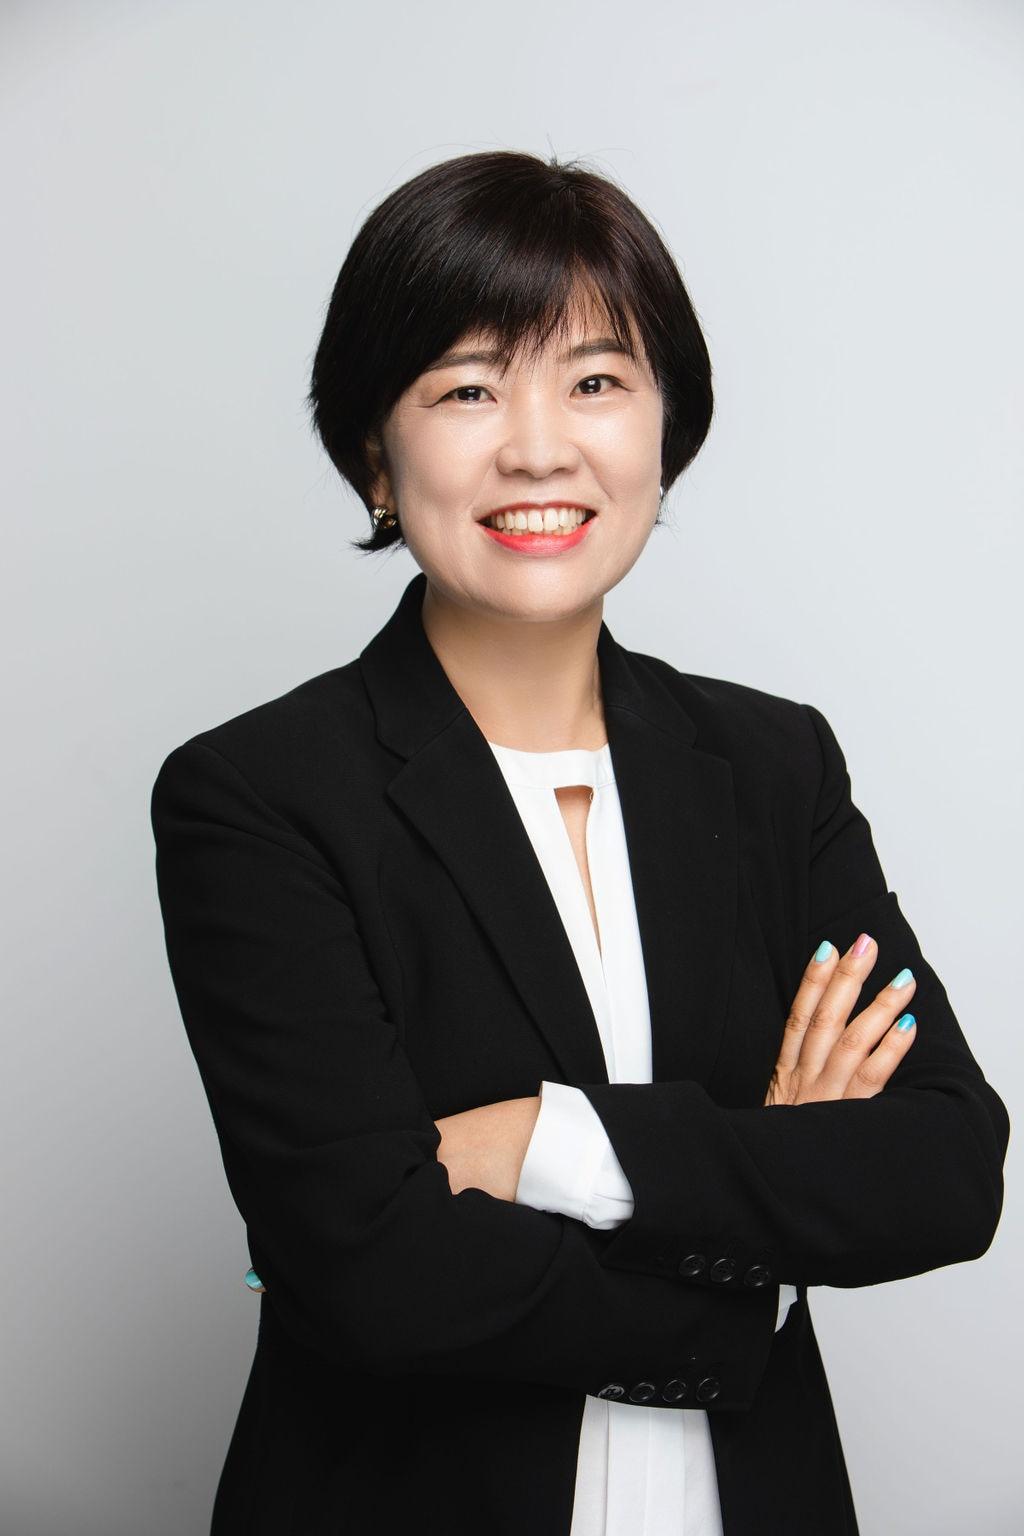 YEONG KIM Financial Professional & Insurance Agent